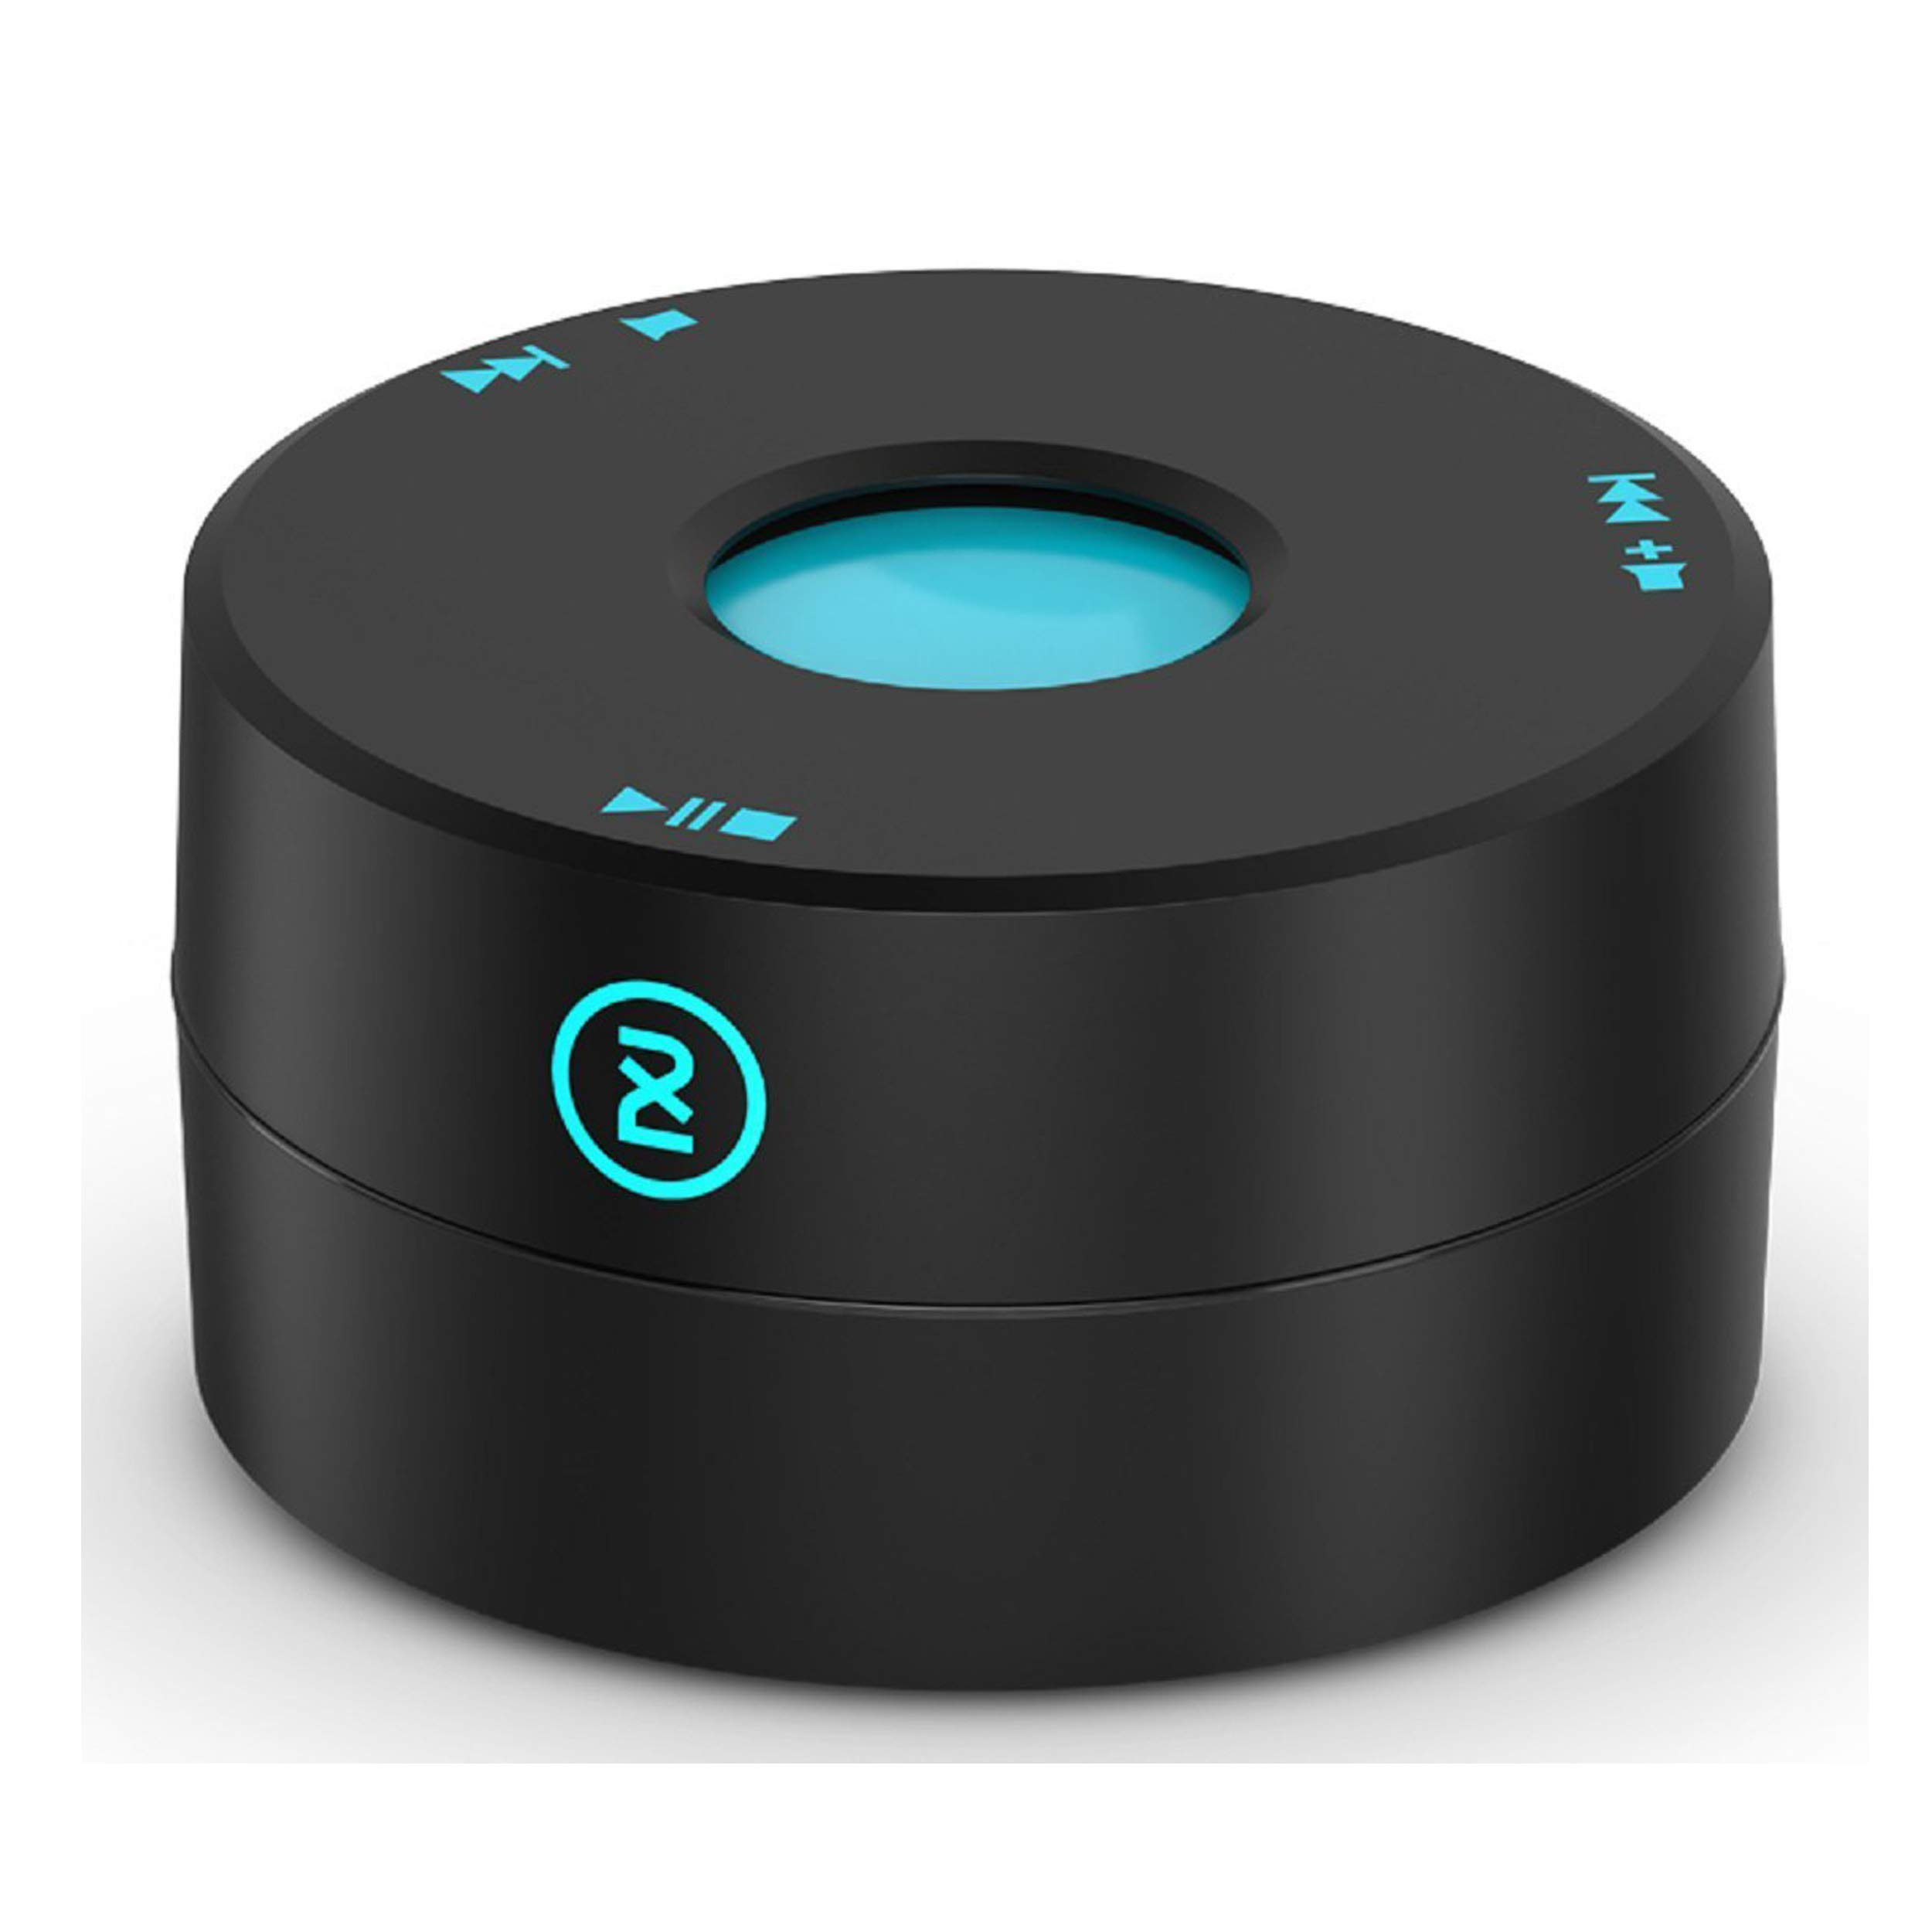 Bluetooth Speakers, Portable True Wireless Speaker with...